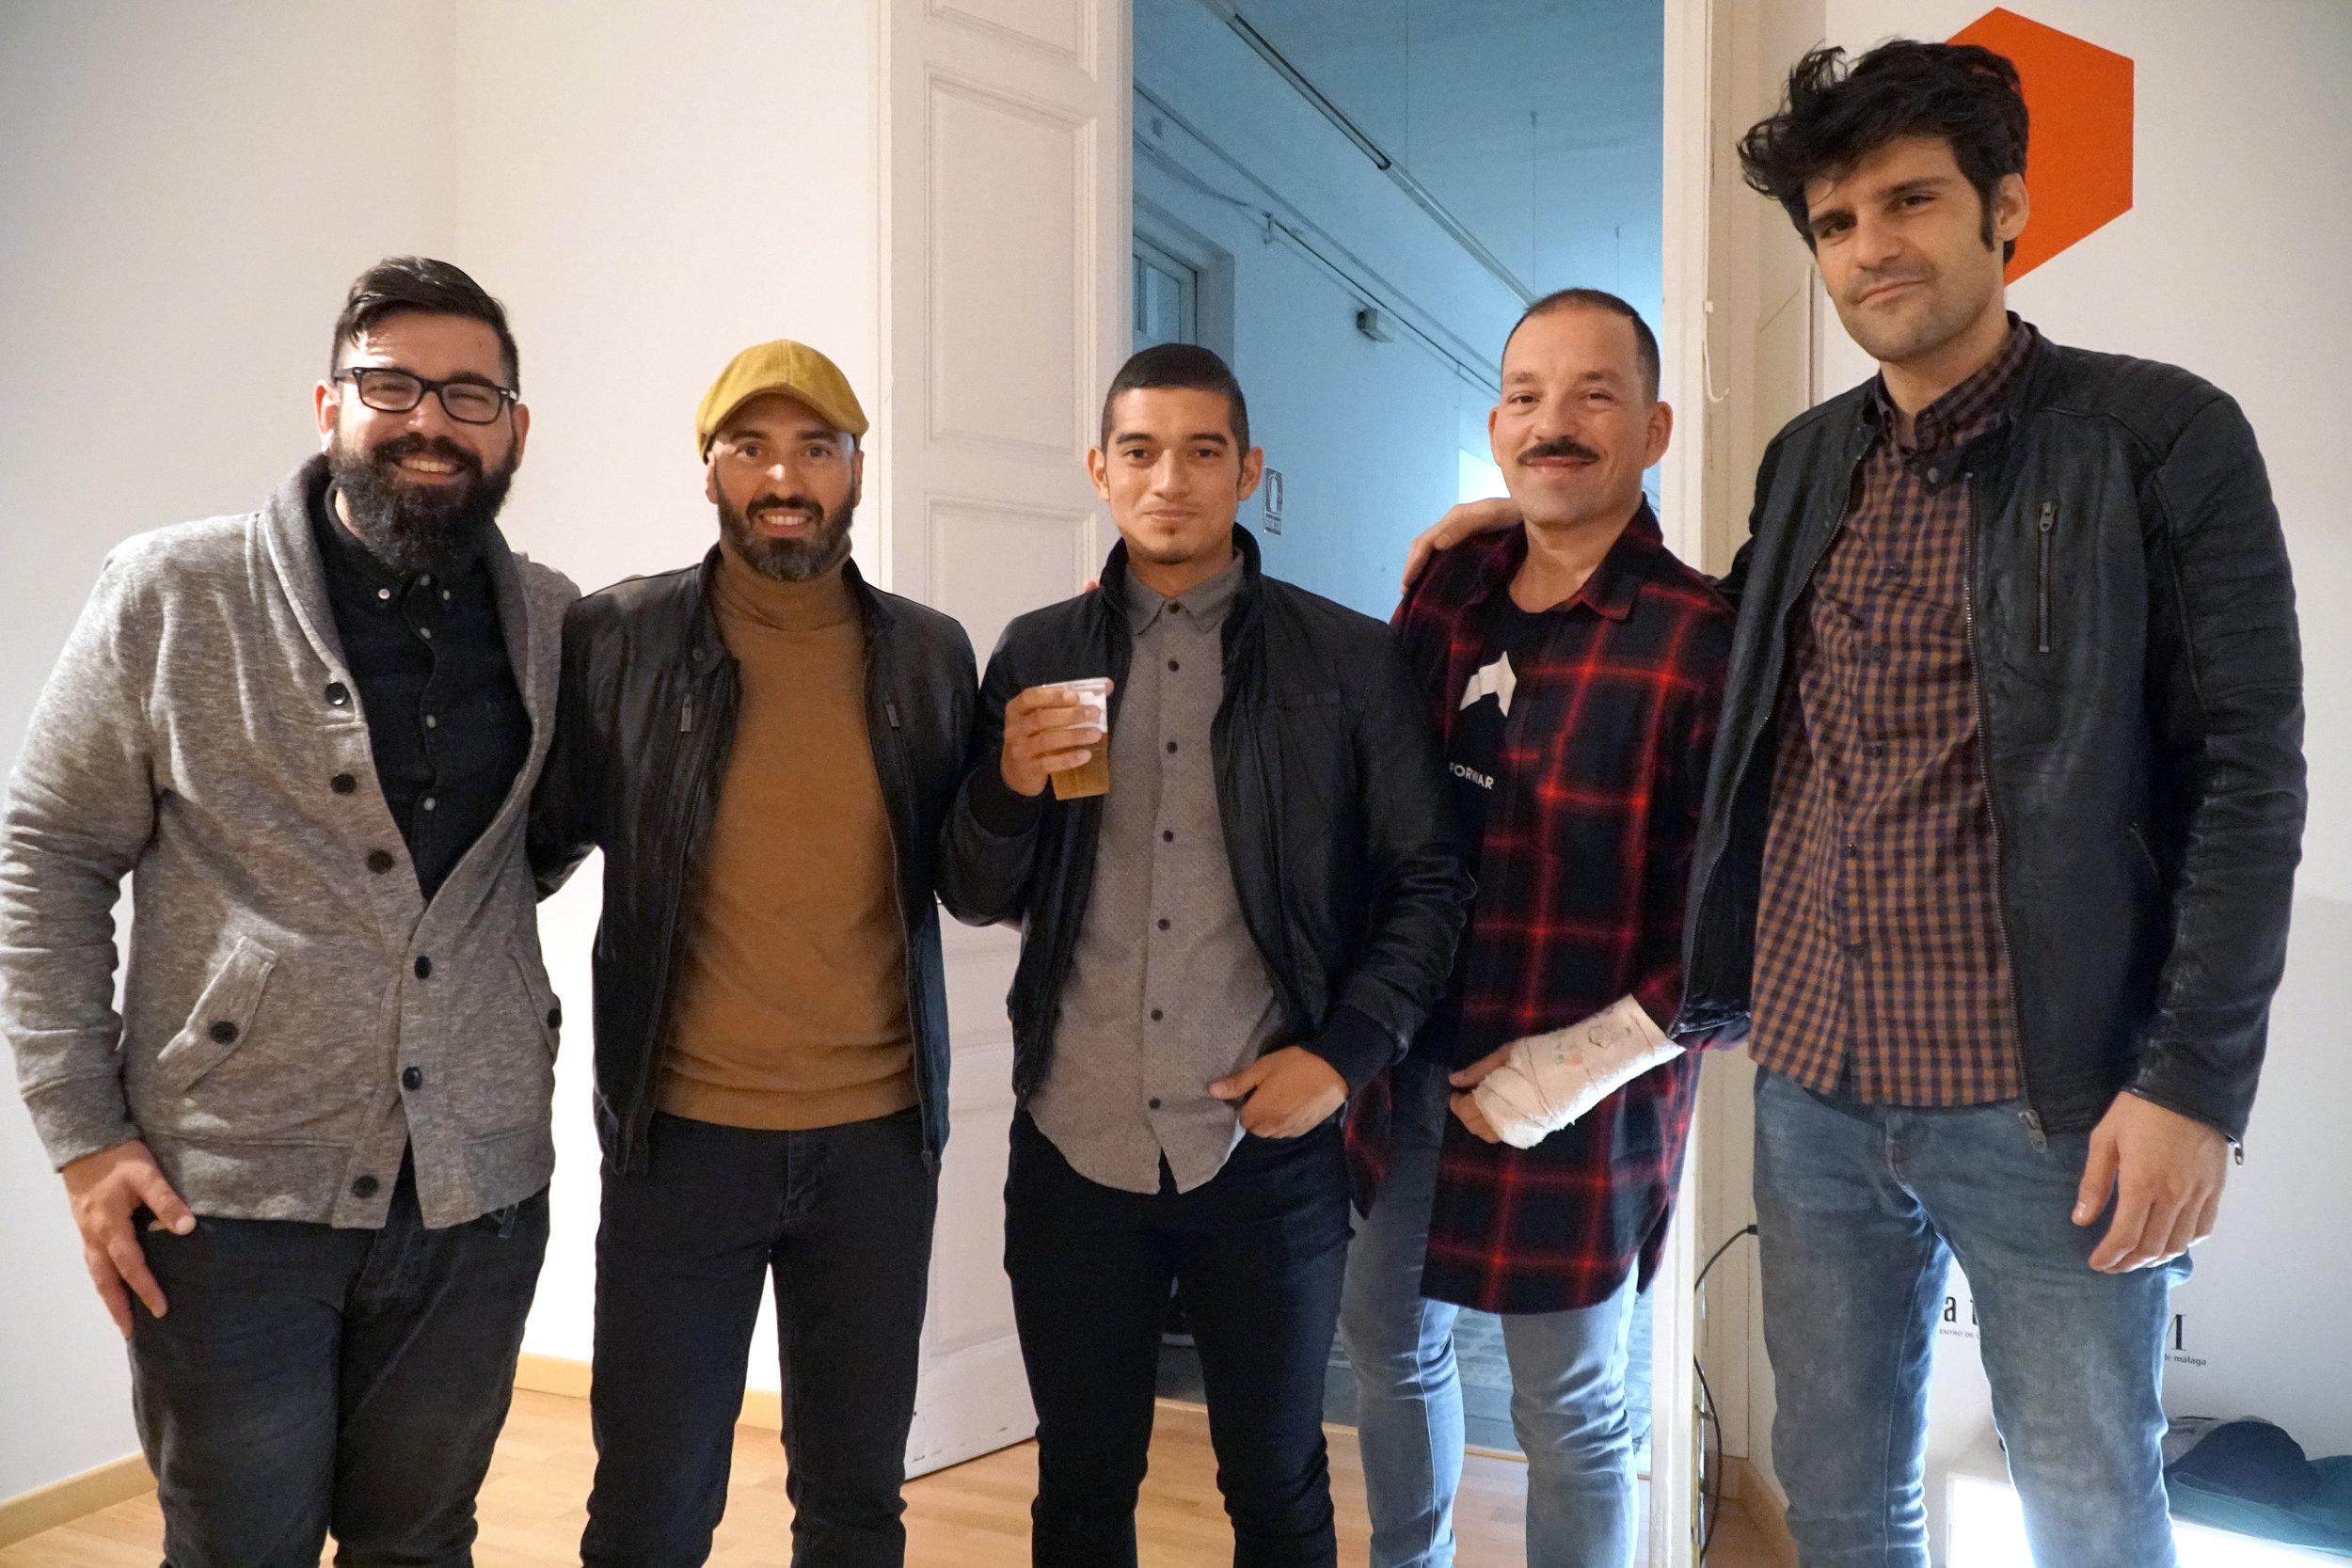 eldevenir-art-gallery-rafel-jimenez-jose-luis-puche-la-termica-malaga-2 (8).jpg